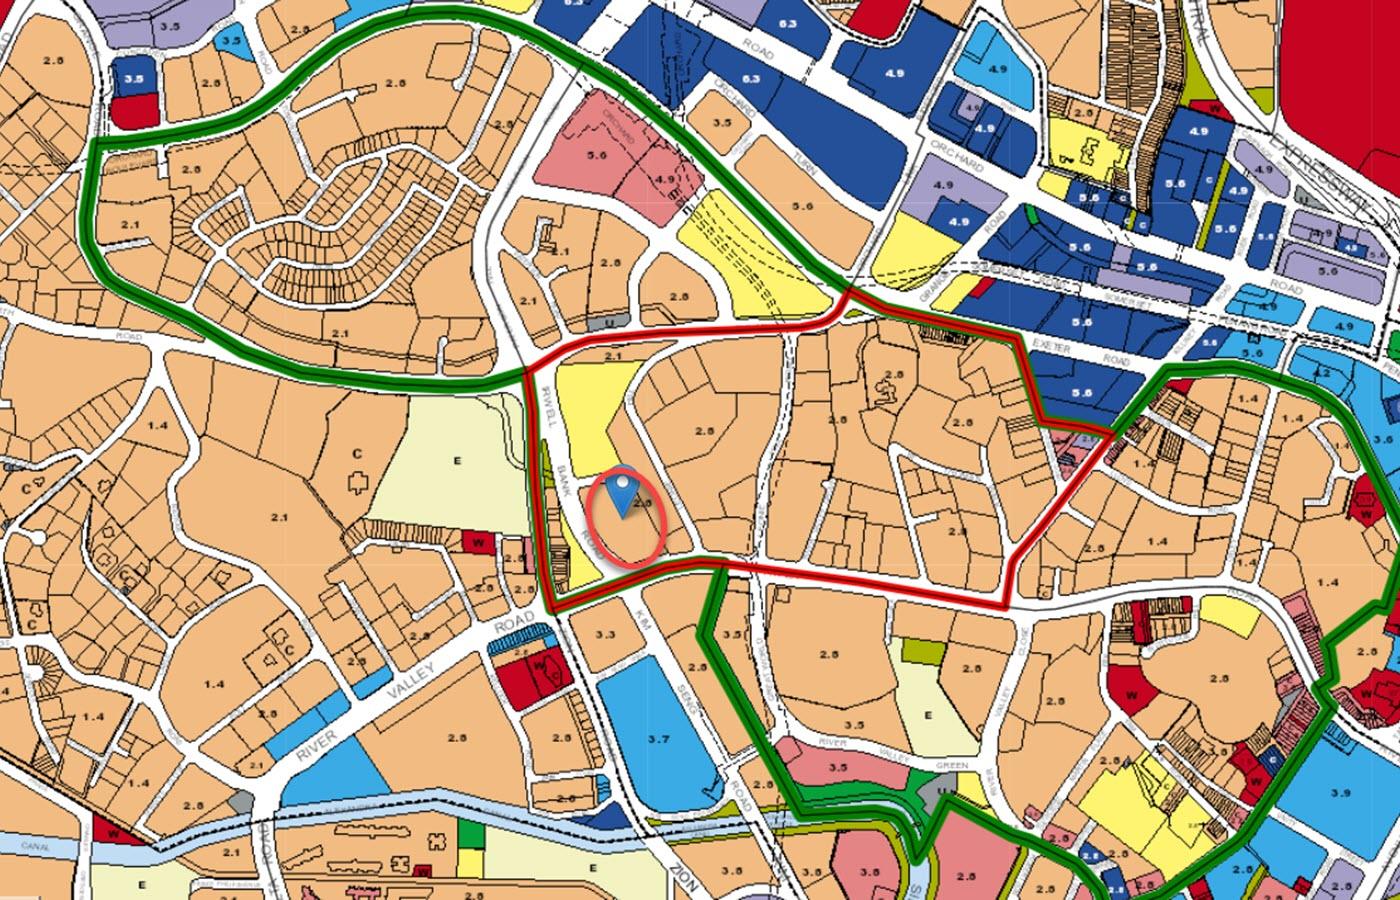 Irwell Hill Residences Condo Location - URA Master Plan Map